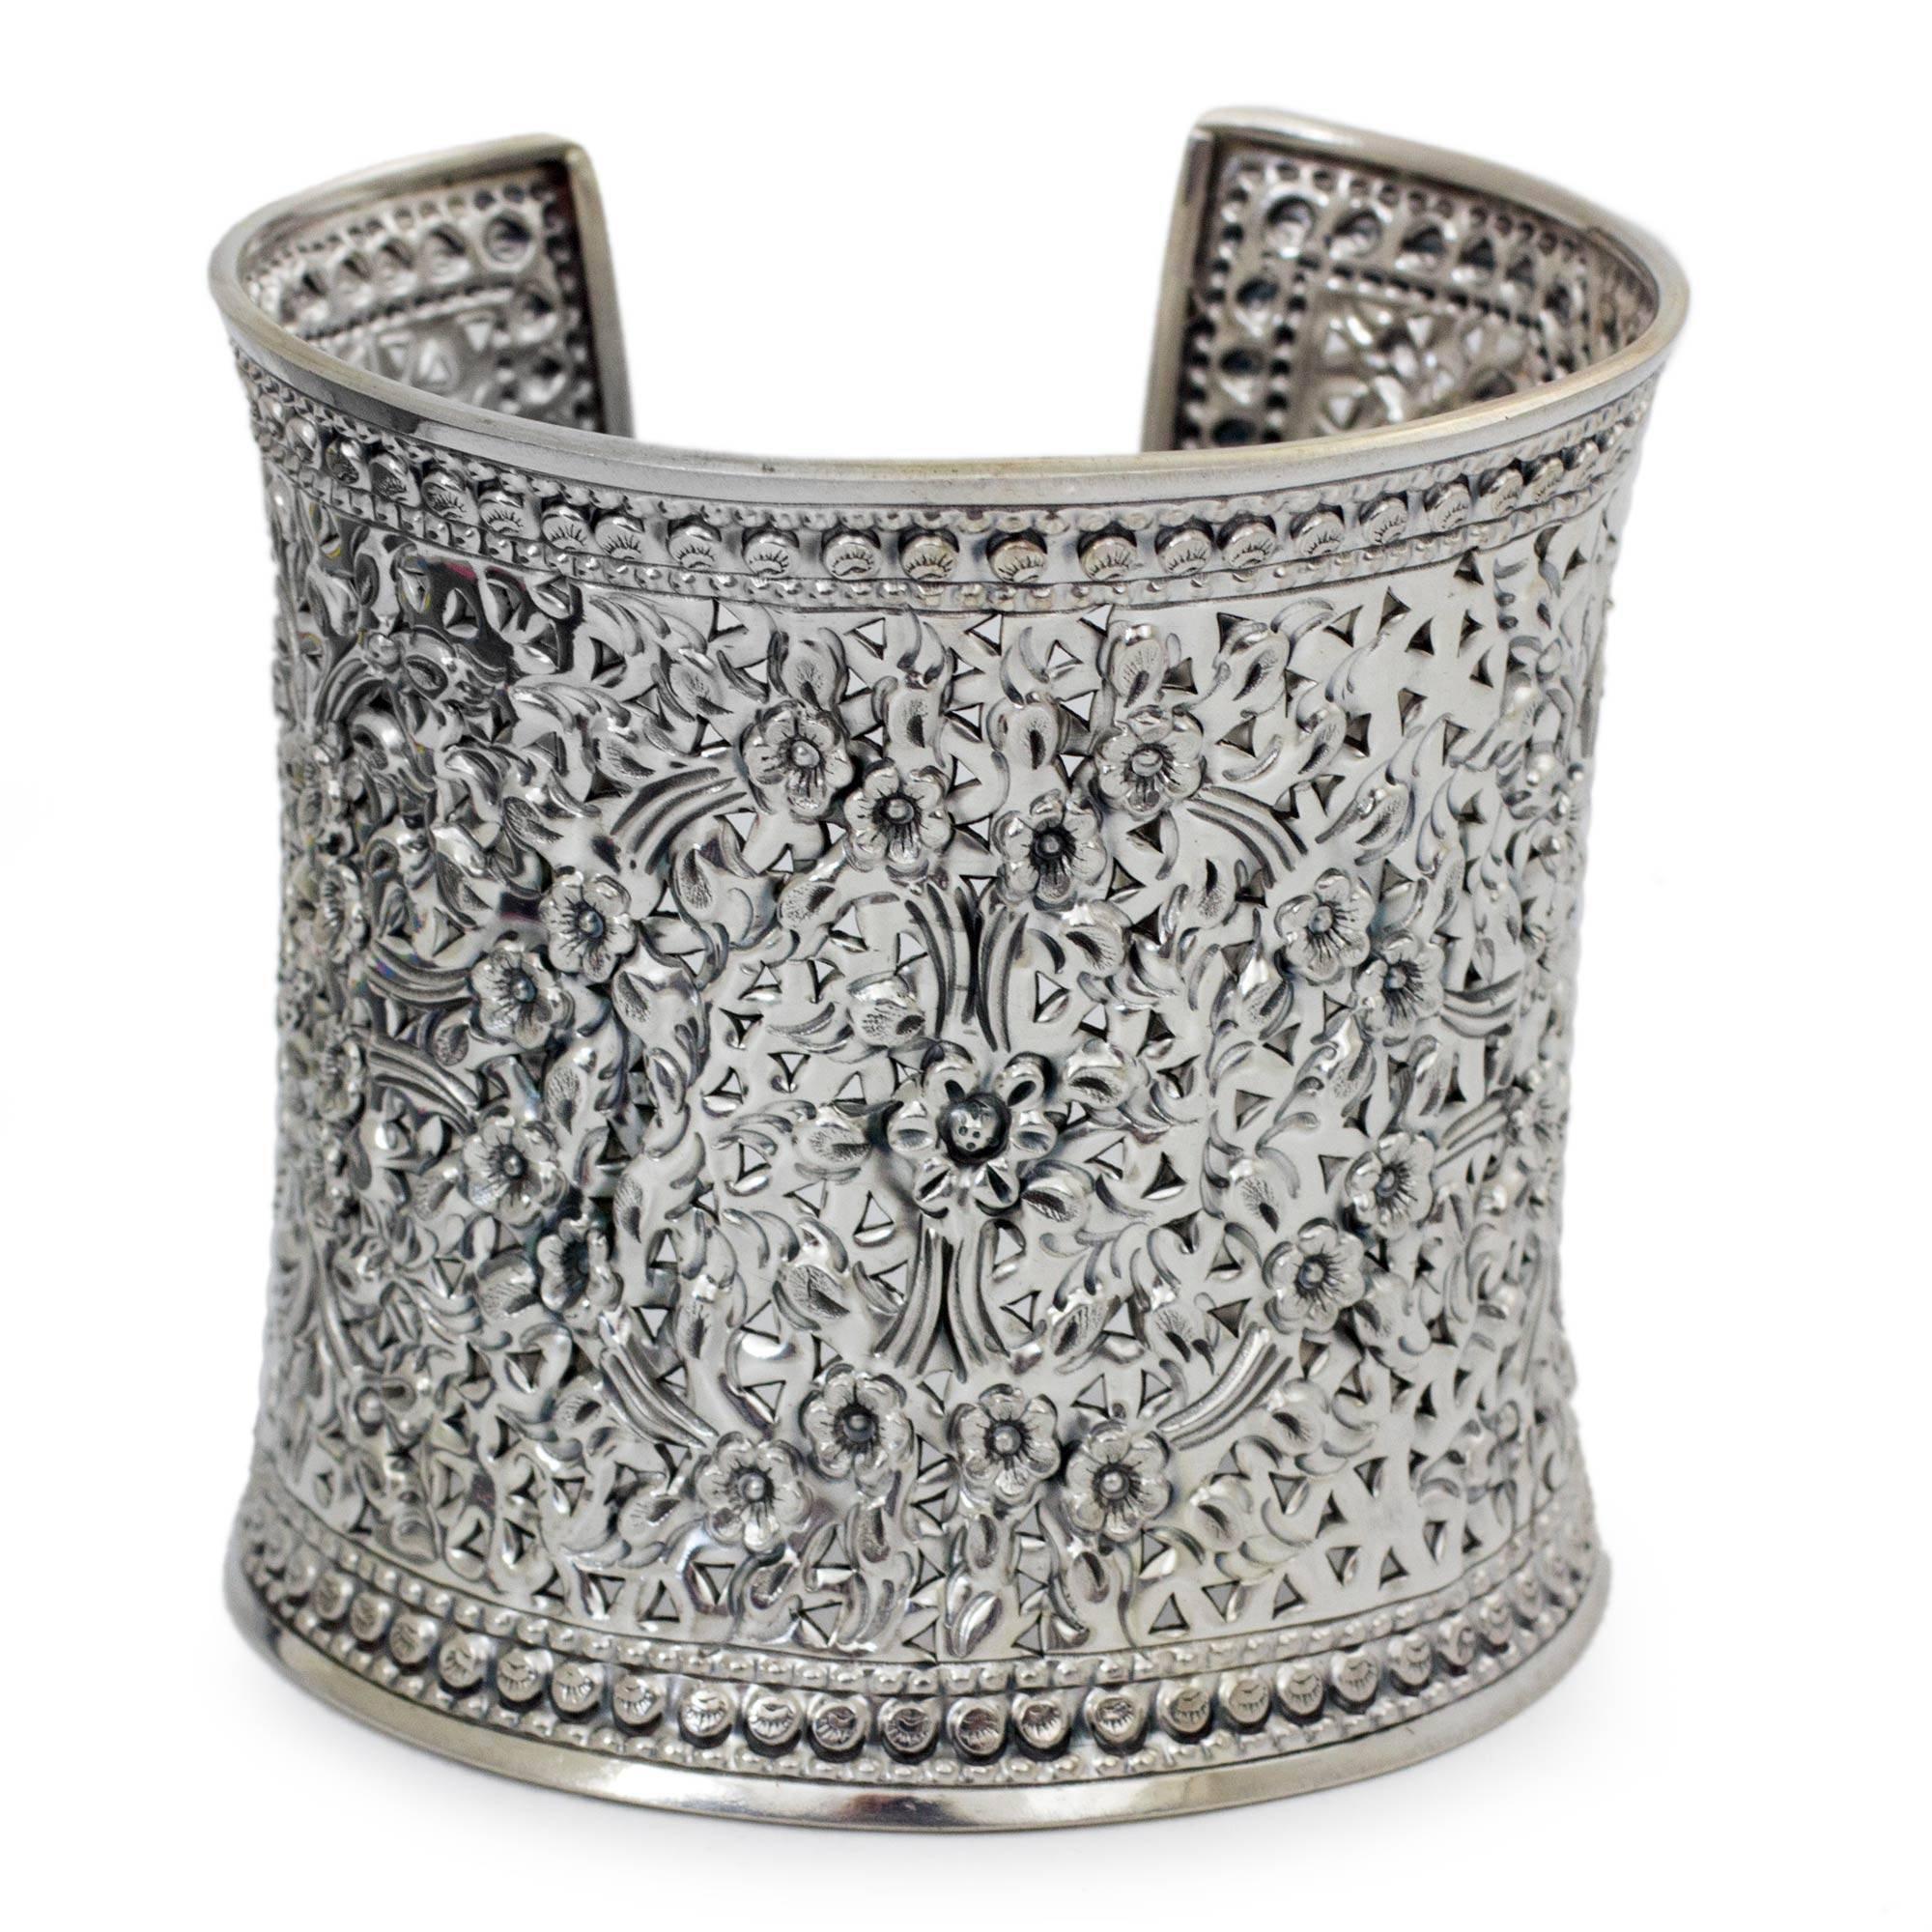 NOVICA .925 Sterling Silver Cuff Bracelet, 6.25'', 'Dazzling Jasmine'